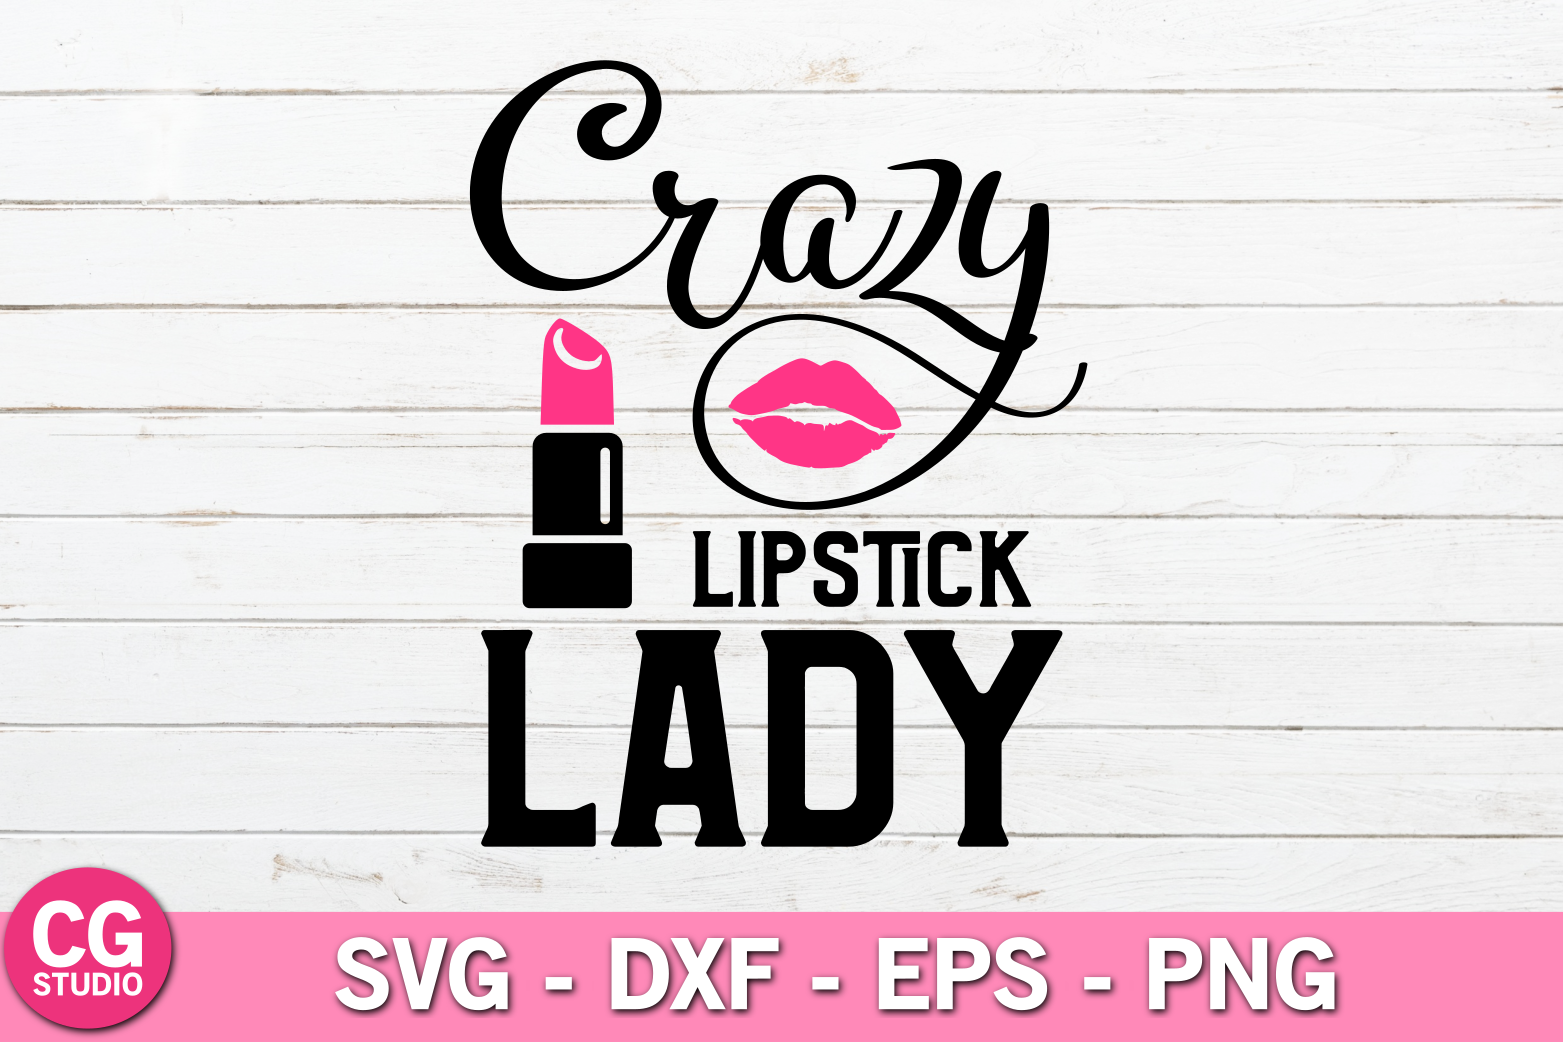 Crazy lipstick lady SVG example image 1